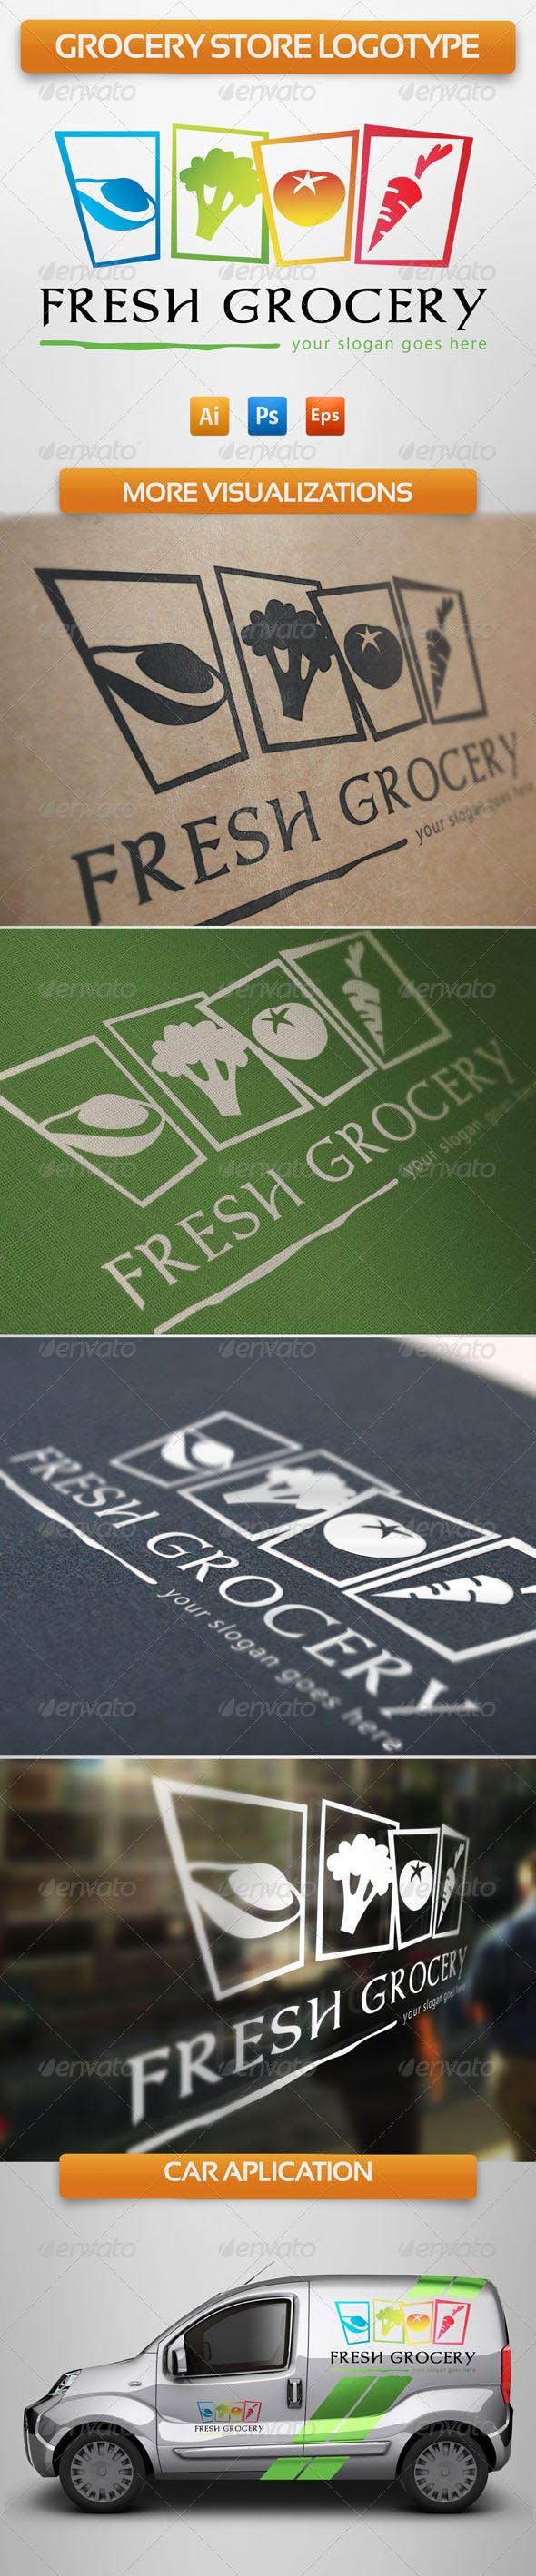 Дизайн логотипа склада Овощебазы для визитки